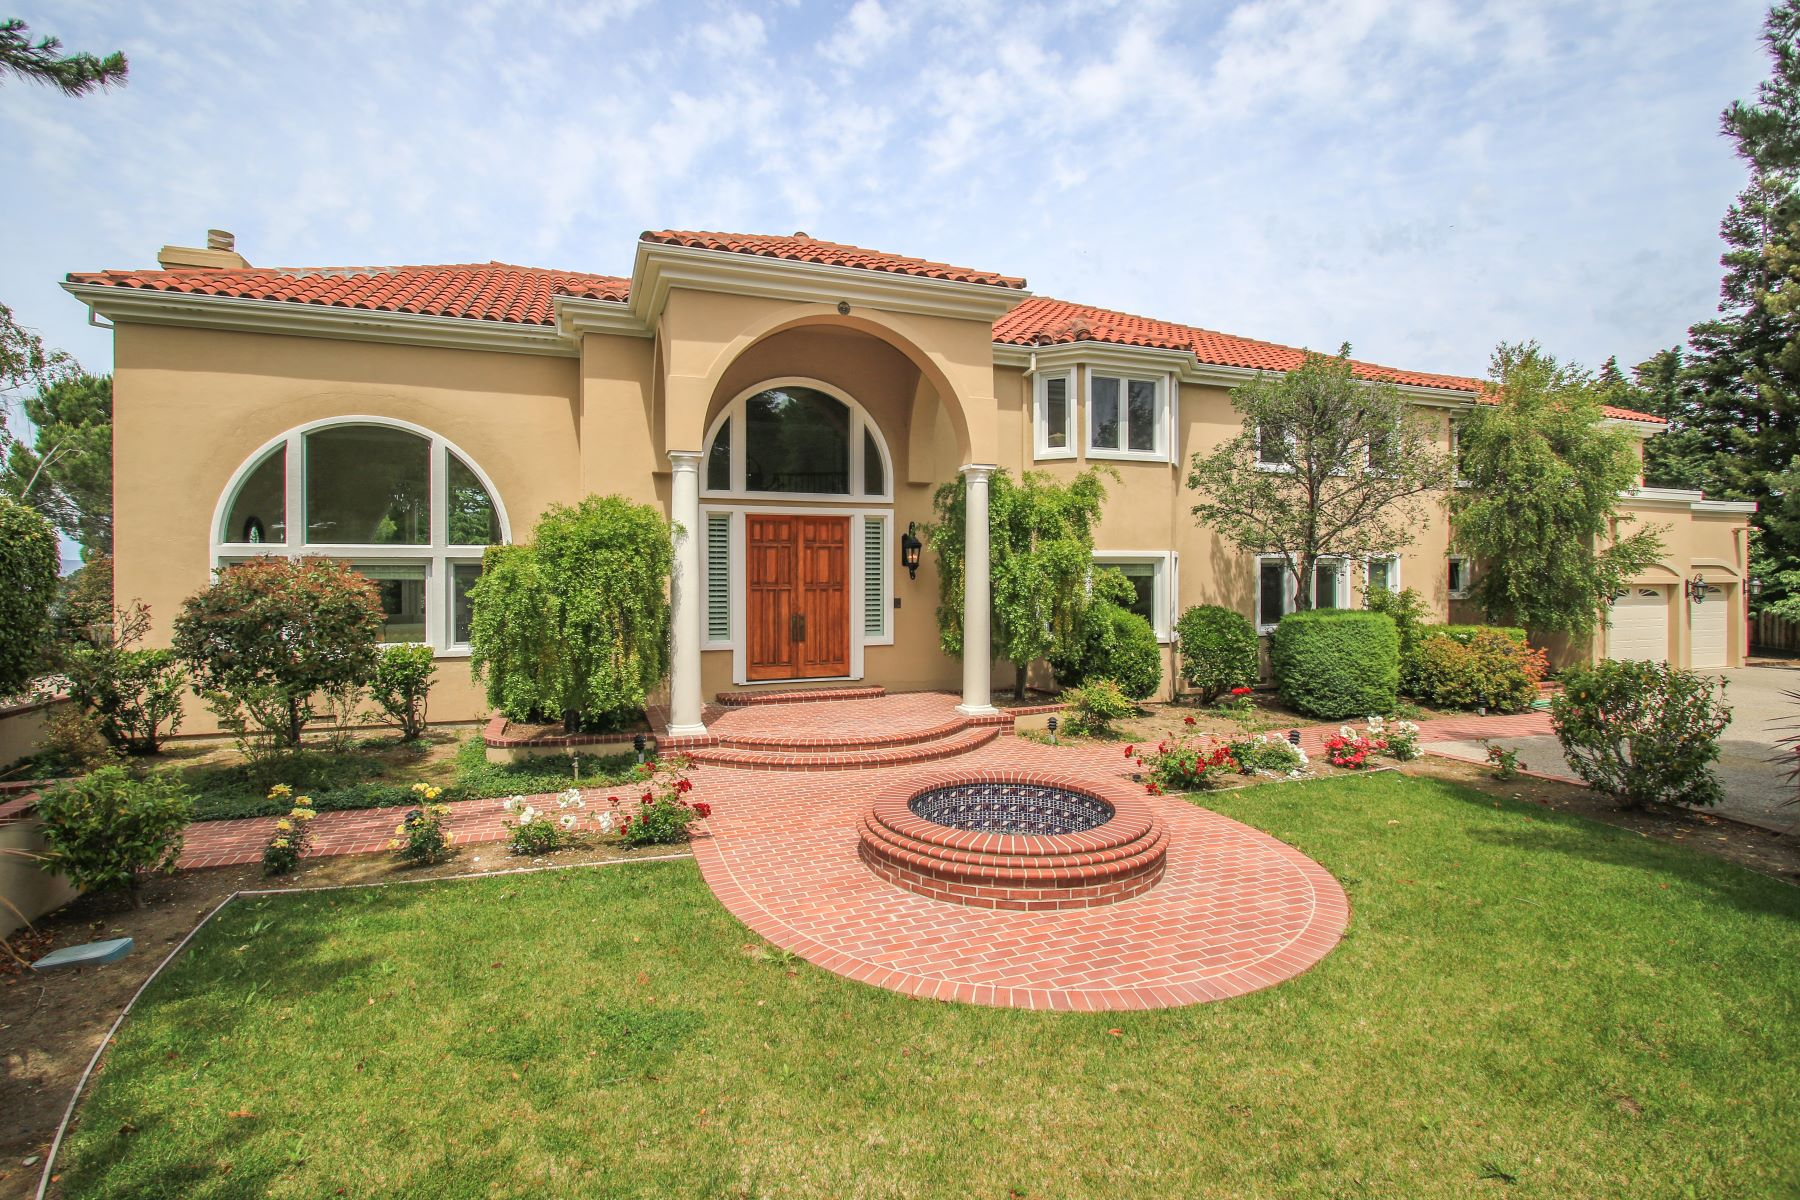 Single Family Homes for Sale at Stunning Mediterranean Estate 75 Eugenia Way Hillsborough, California 94010 United States